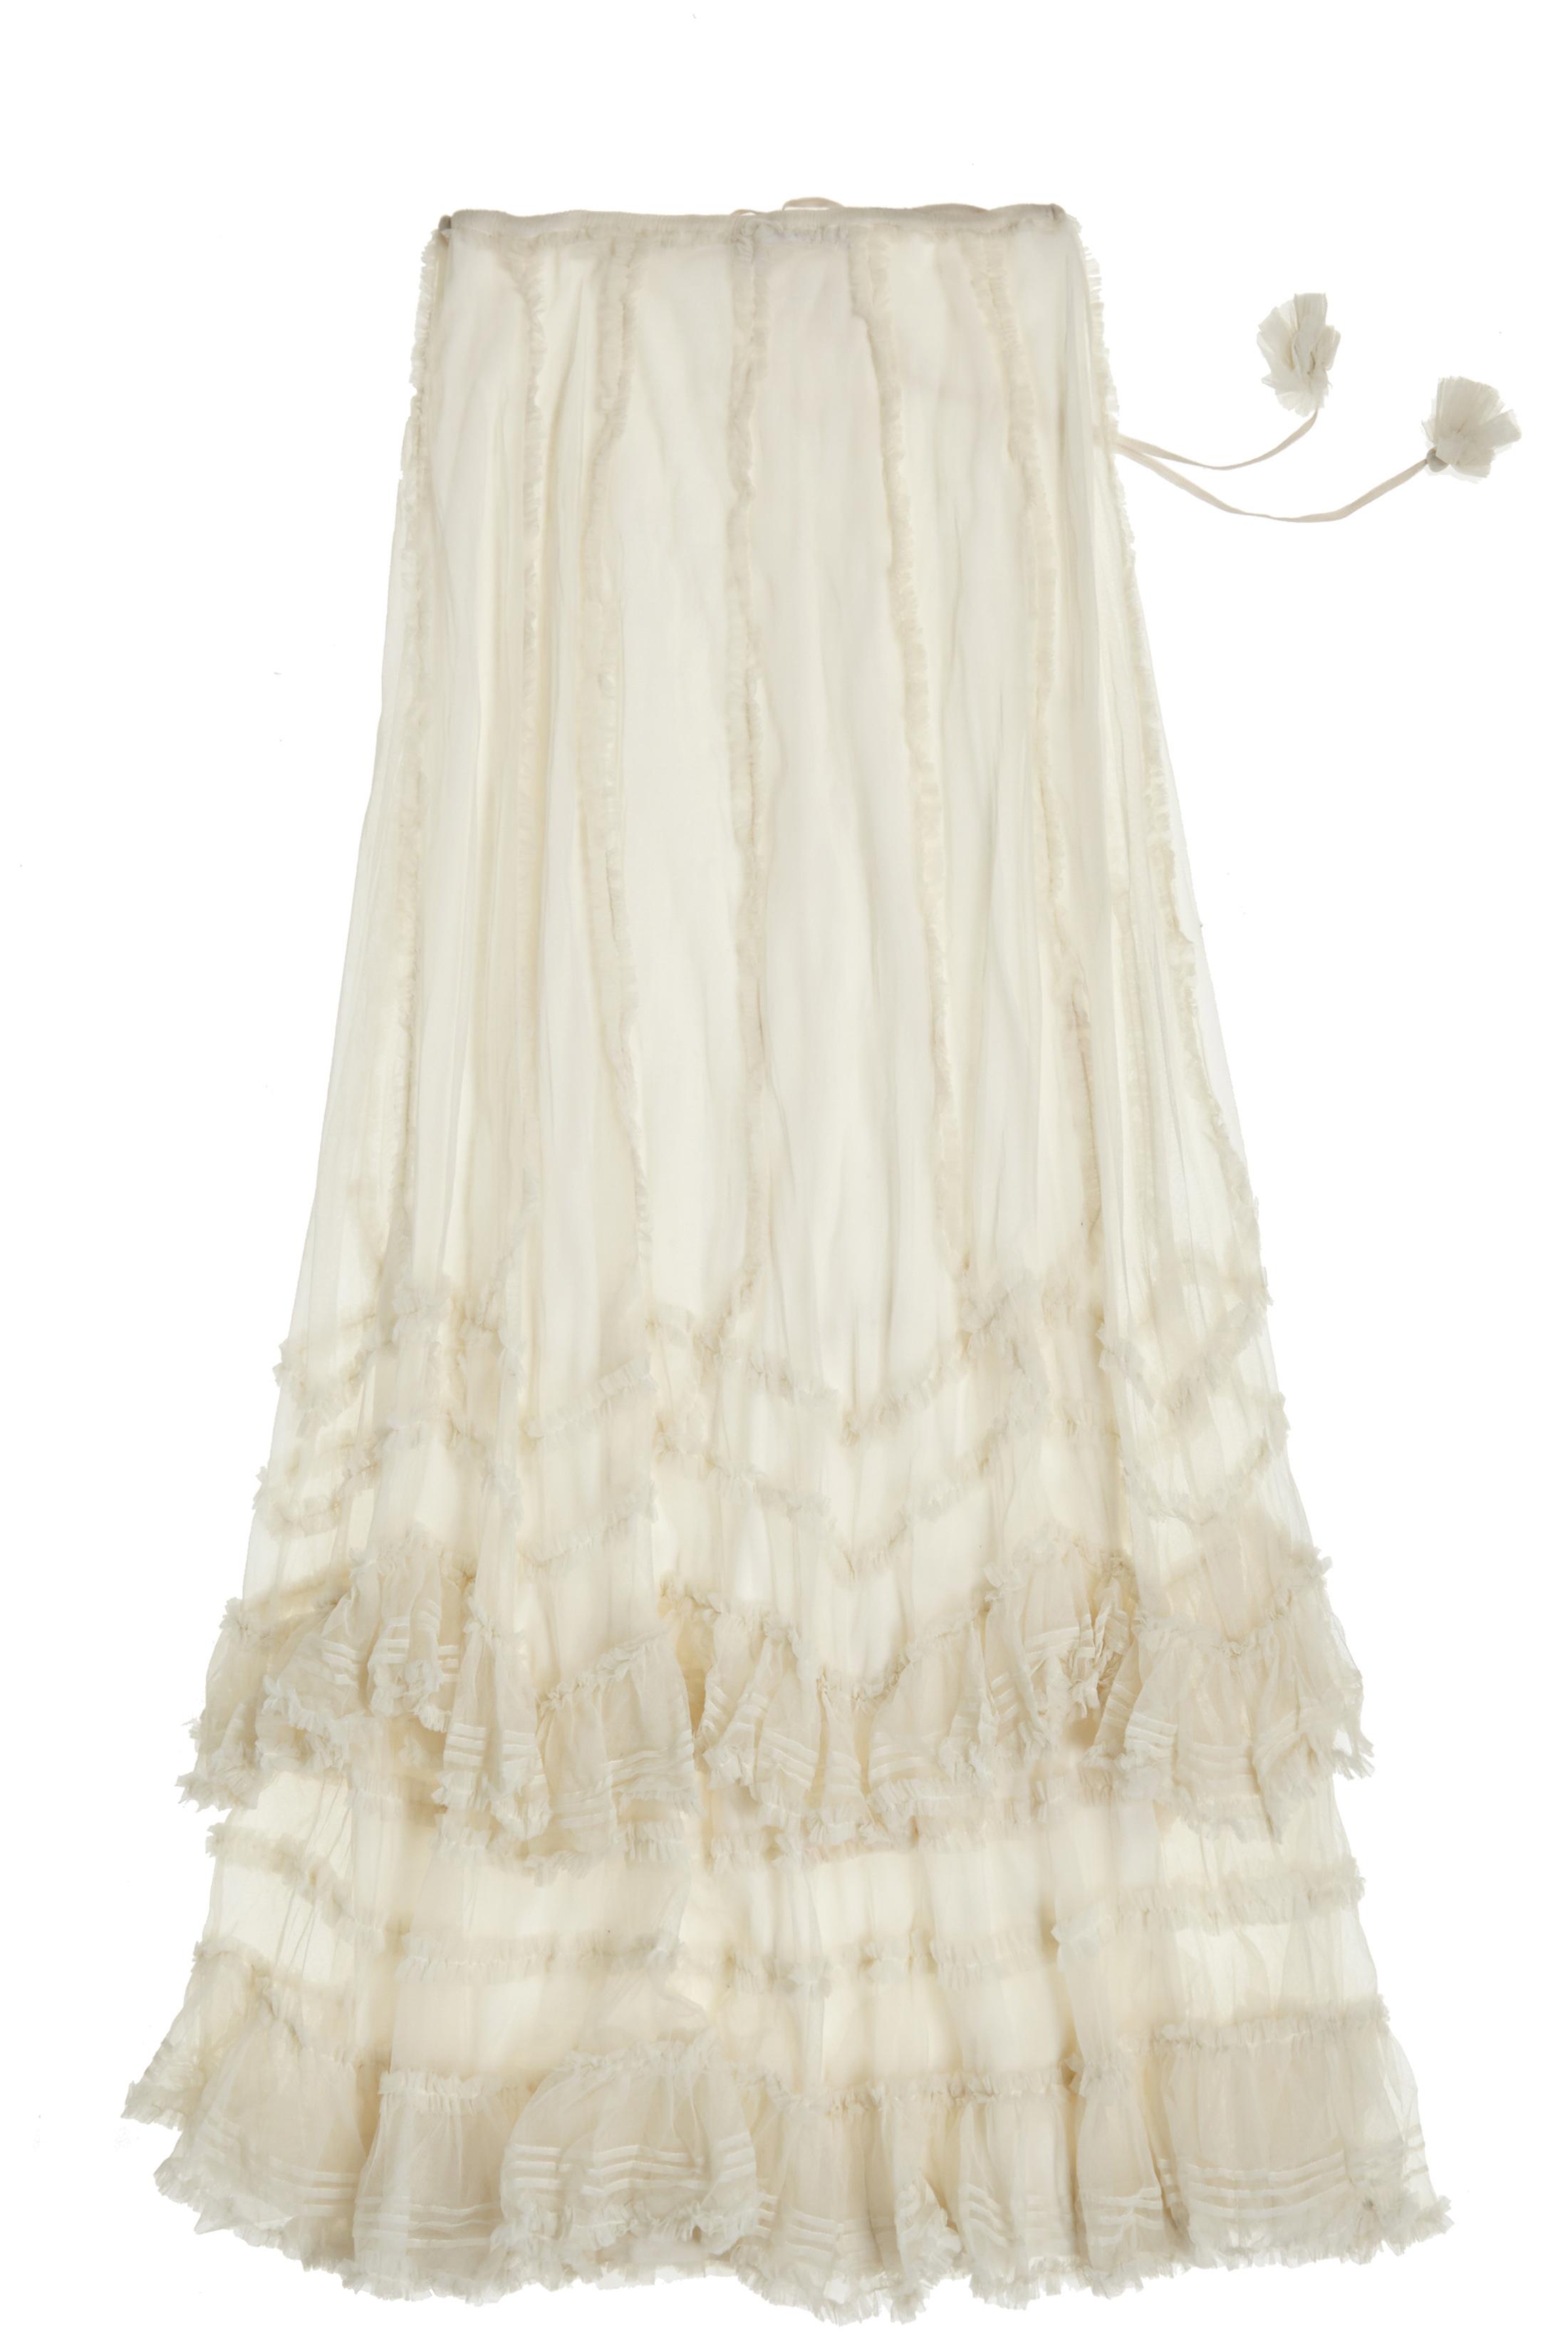 calypso-st-barth-bridal-bao-skirt-0315.jpg